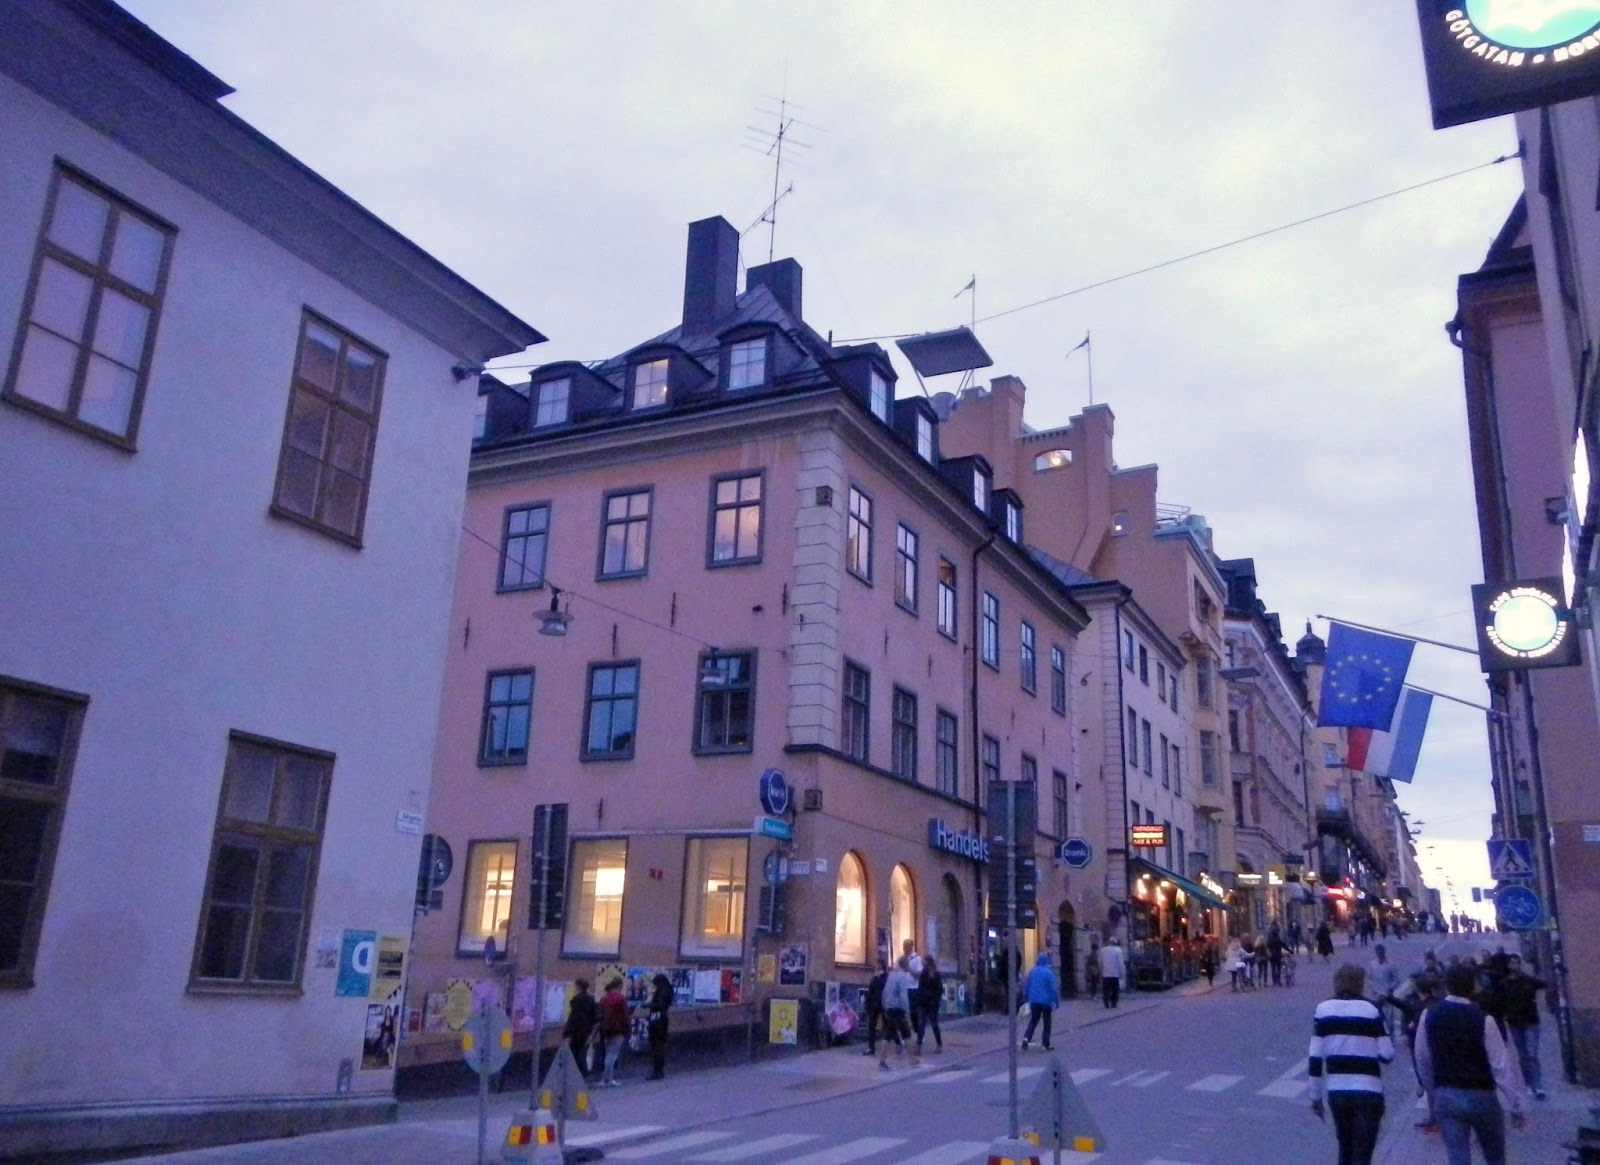 Sodermalm, Sweden